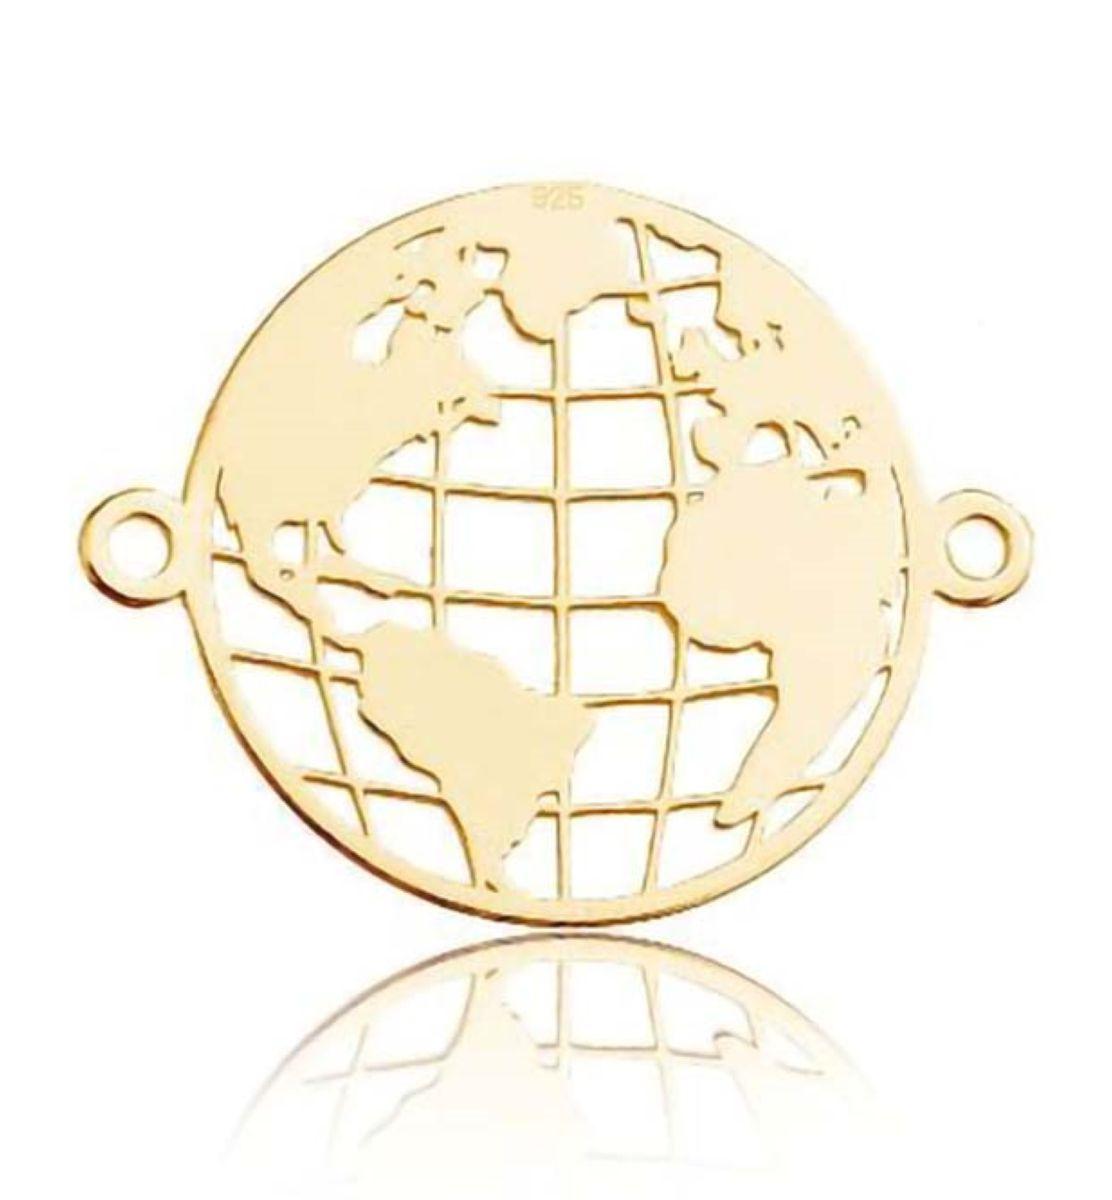 Schmuckverbinder Globus 925 Silber, 22x17 mm 1 Stück, Farbe wählbar